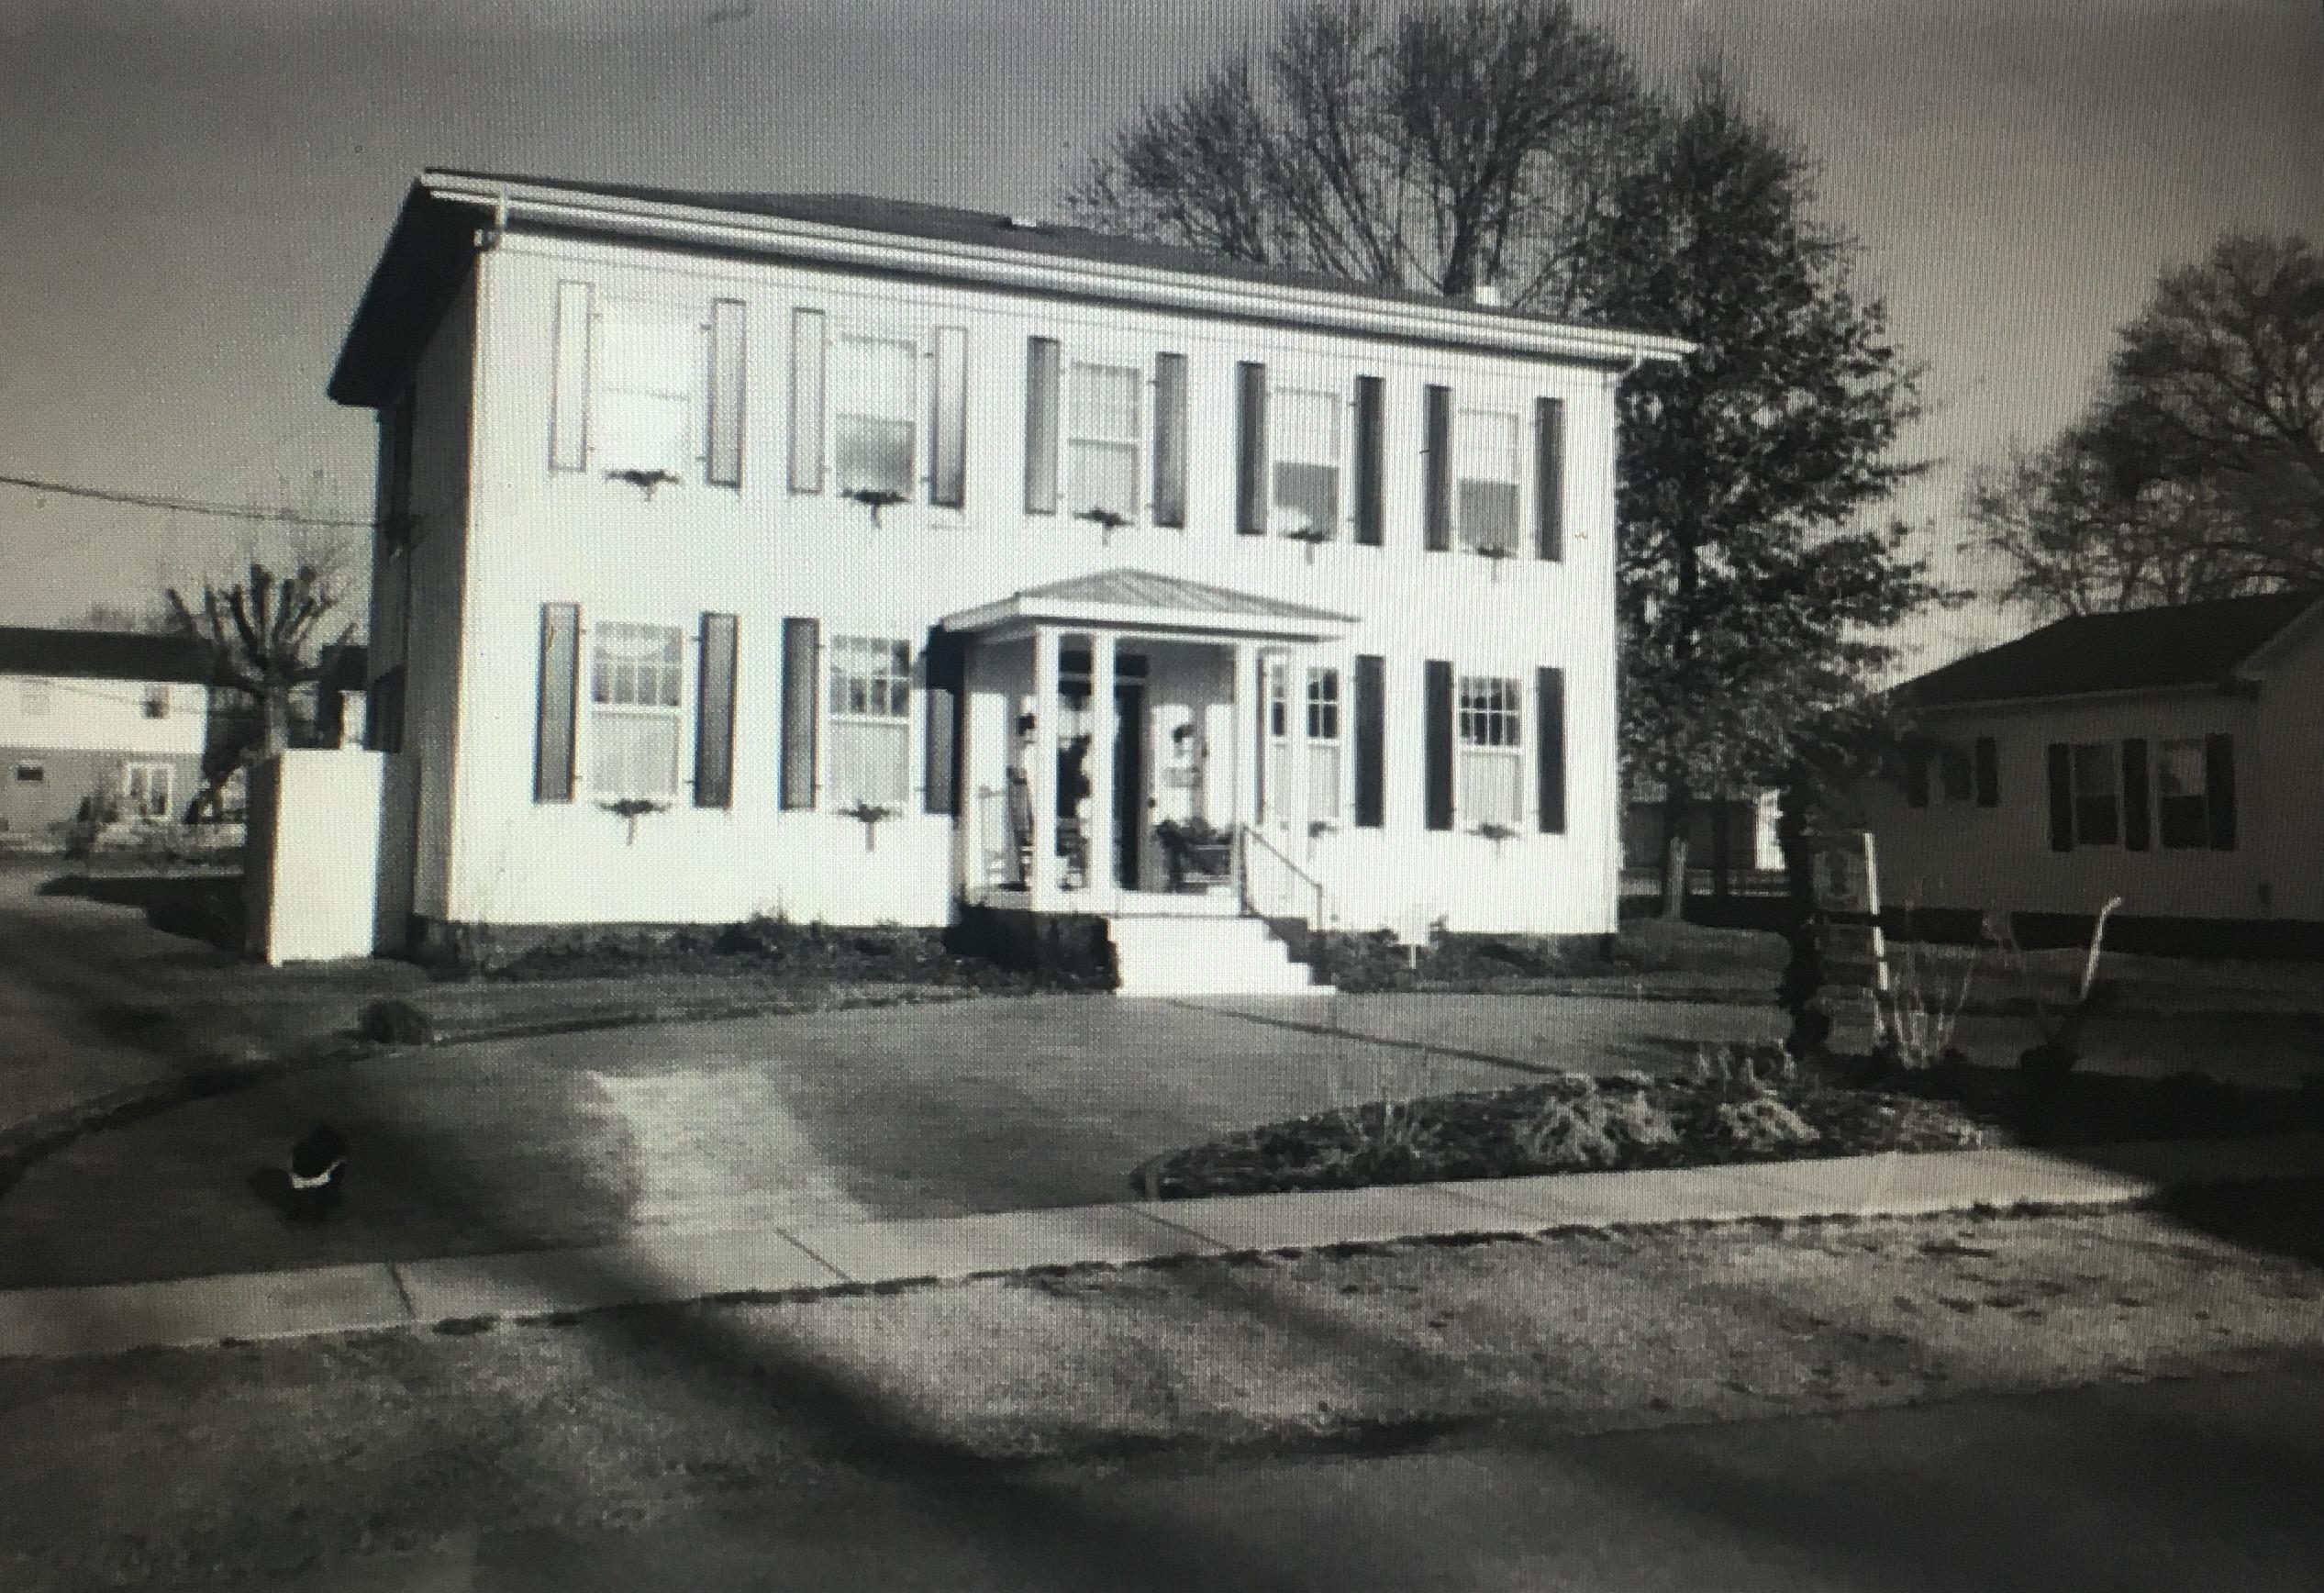 Asbury House (1995)